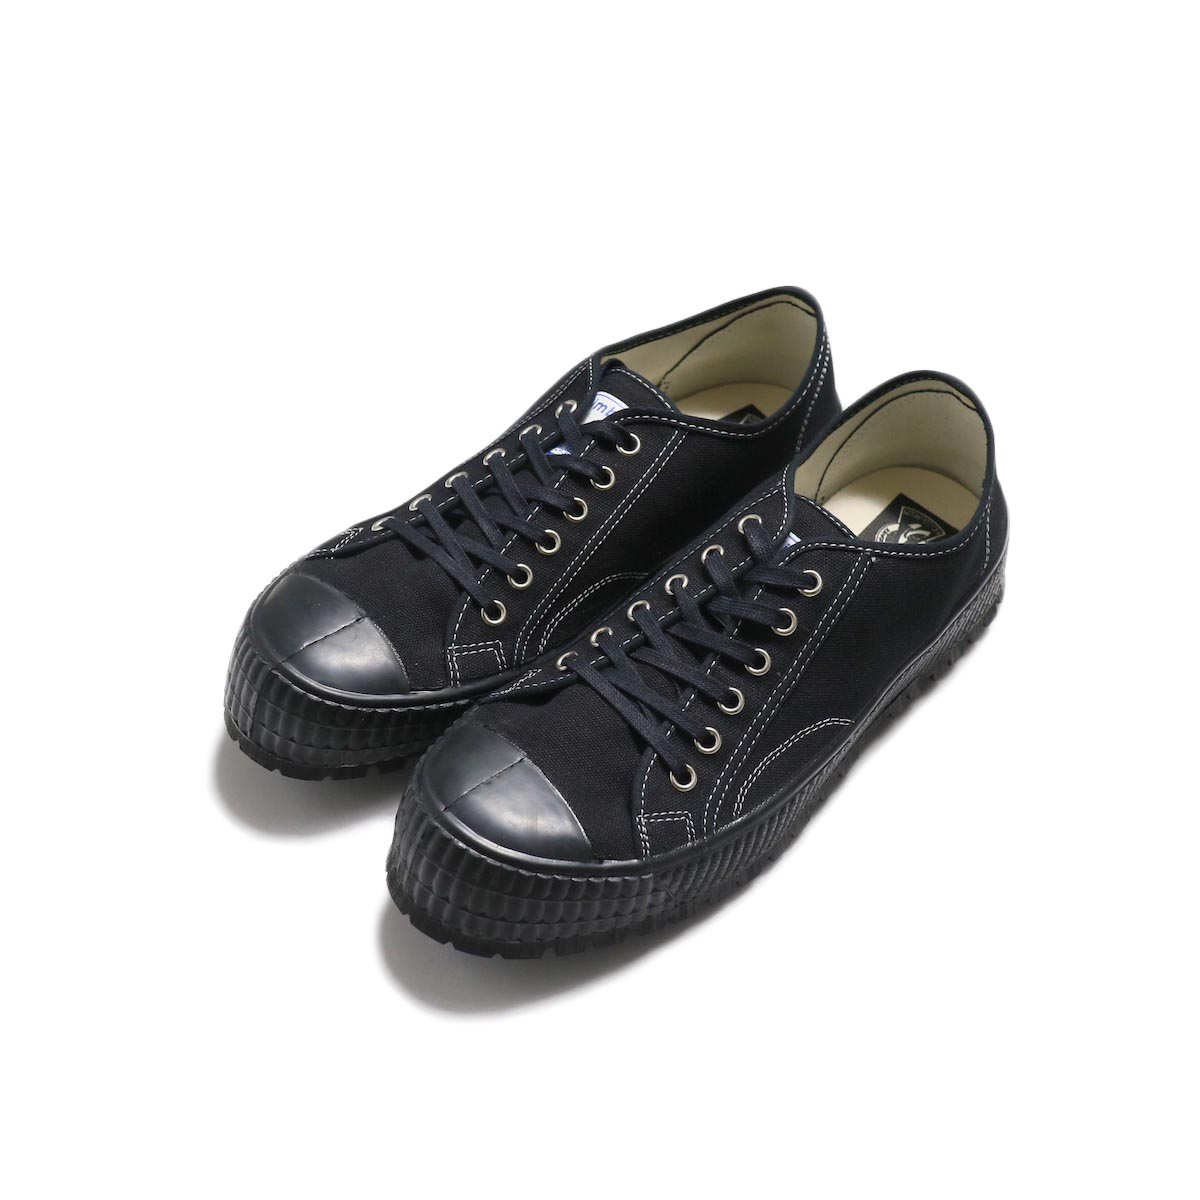 ZDA / 2100-F Climber Sole Cnavas Sneaker (Black)00-F Climber Sole Cnavas Sneaker -Black